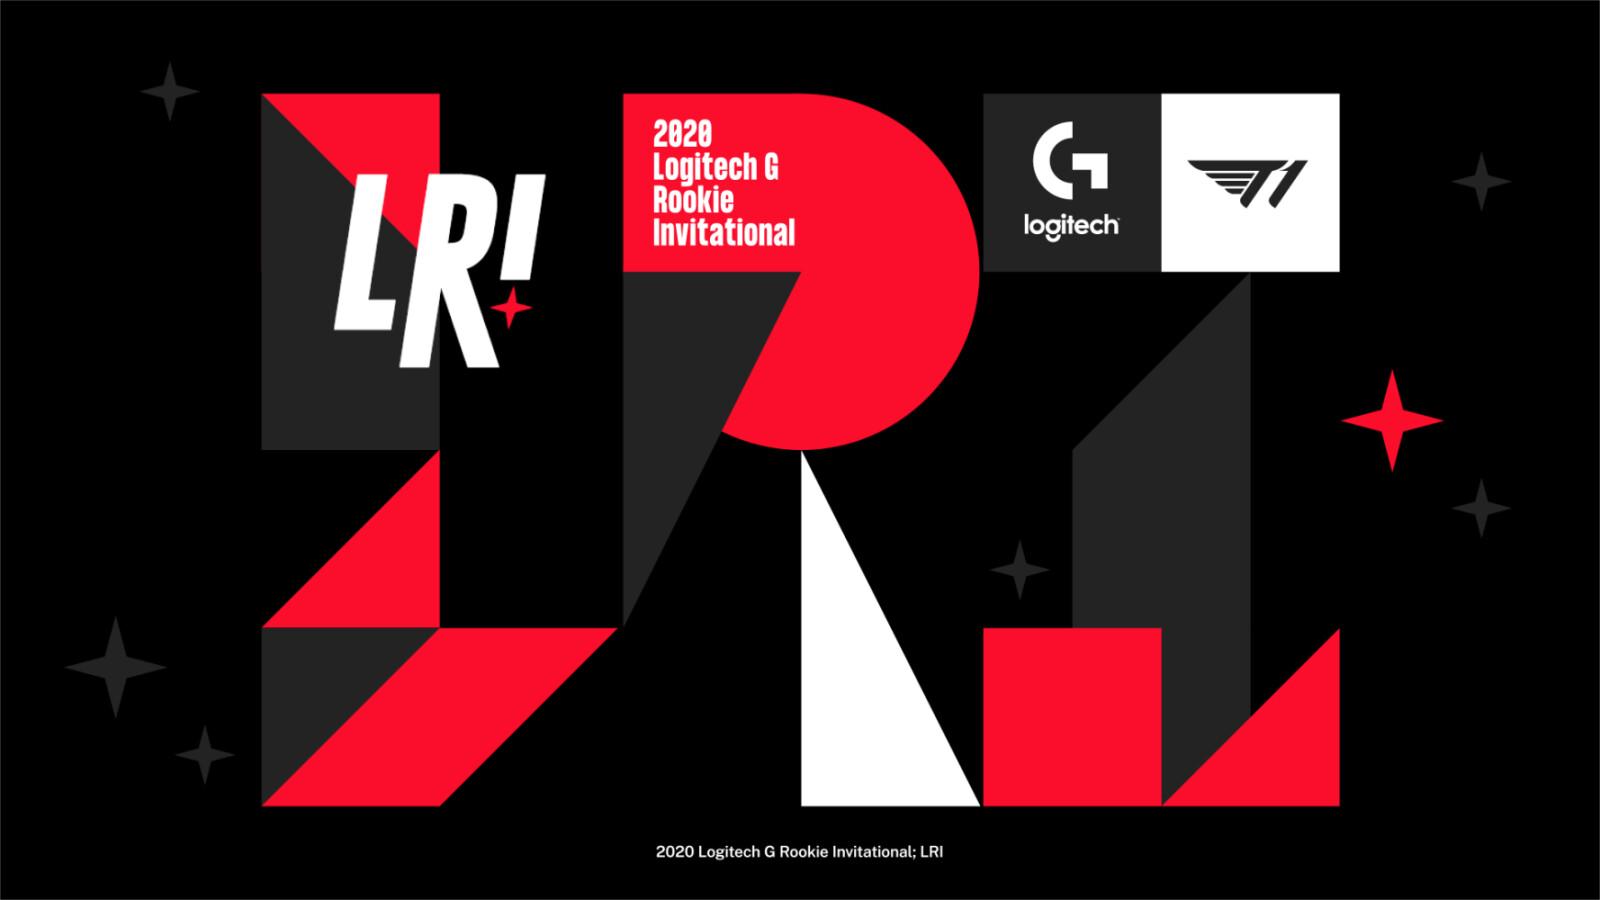 T1, 로지텍 G와 함께 리그 오브 레전드 아카데미 이벤트 대회 개최.png